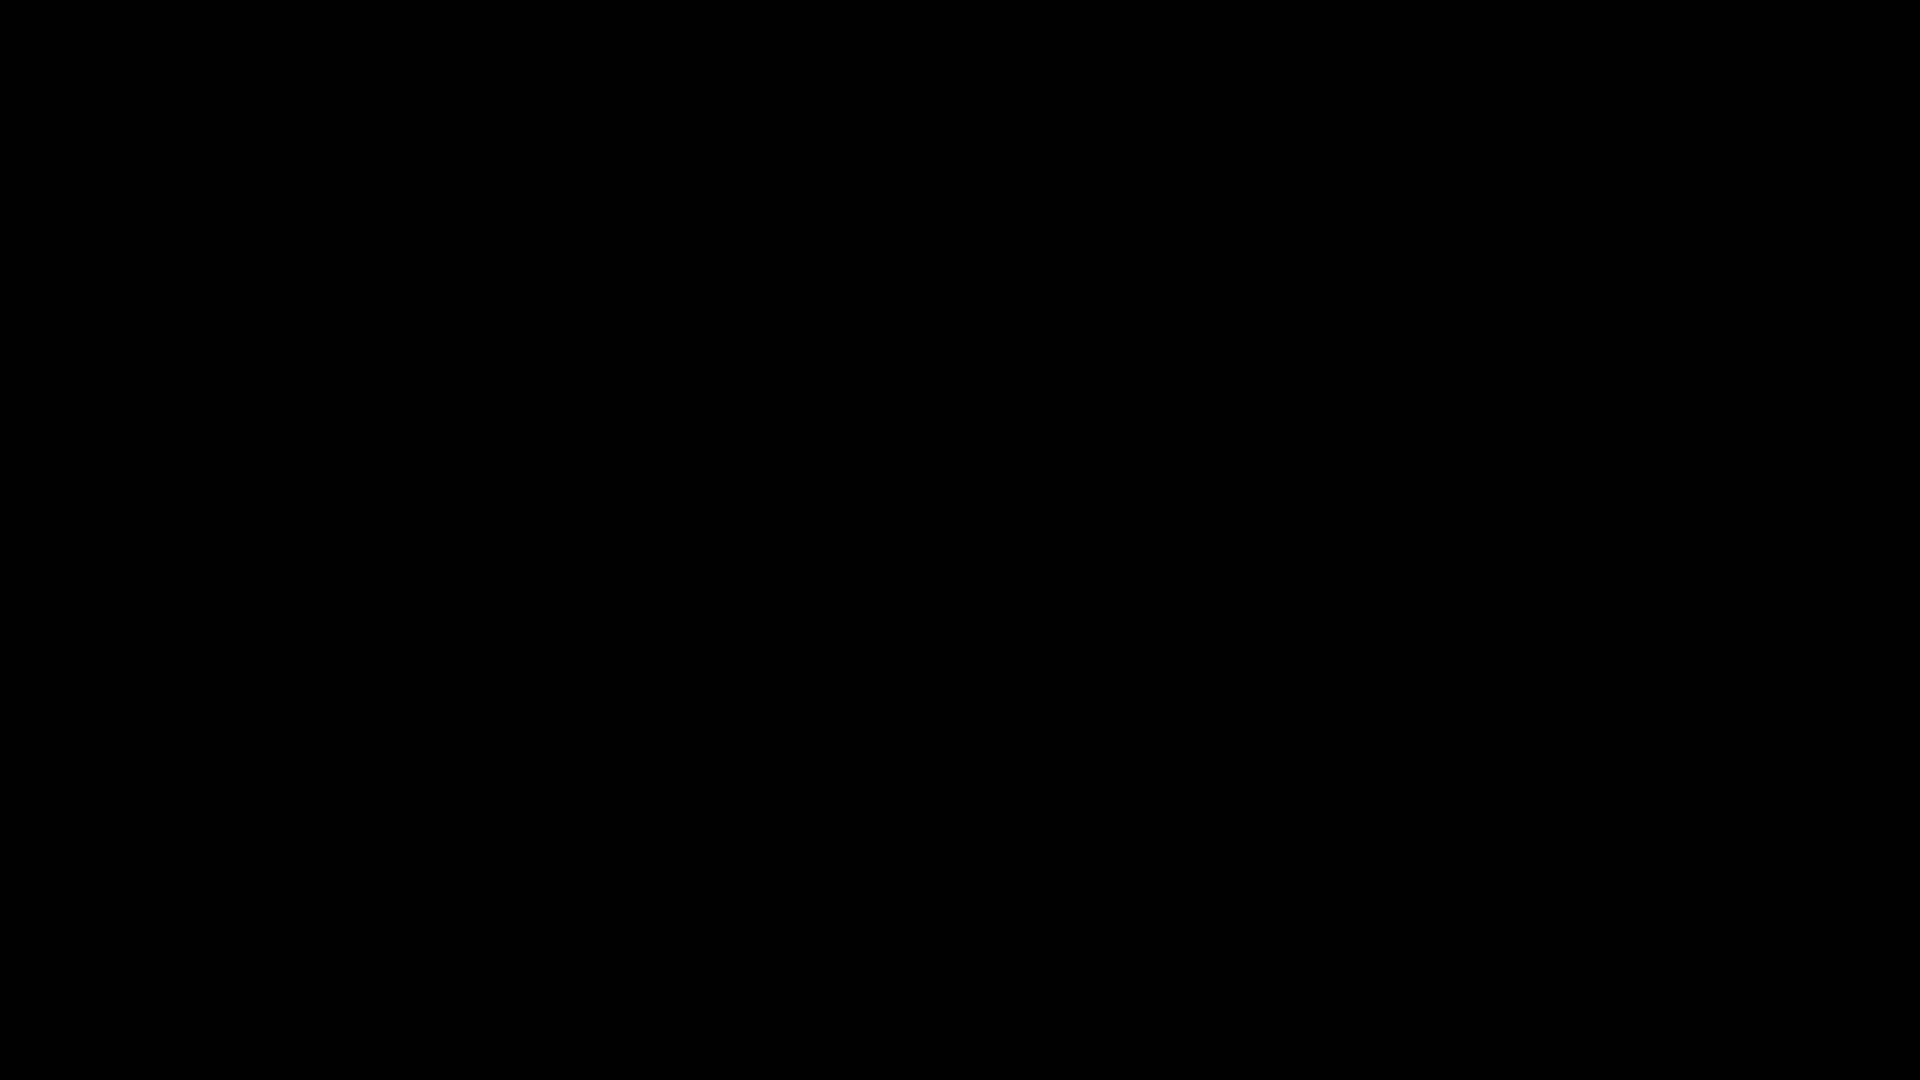 BKT, BURAK OYUNDA, Baran Kadir Tekin, Egg Wars, FURKAN YAMAN, GTAV, Games Time, Games Time BKT, Gaming, Hunger Games, Master Builders, Minecraft, PlayStation, PlayStation 3, PlayStation 4, PlayStation Oyunları, Speed Builders, Youtuber, ps3, ps4, Annem ile e-OKUL notlarıma baktık ! - Vlog BKT GIFs